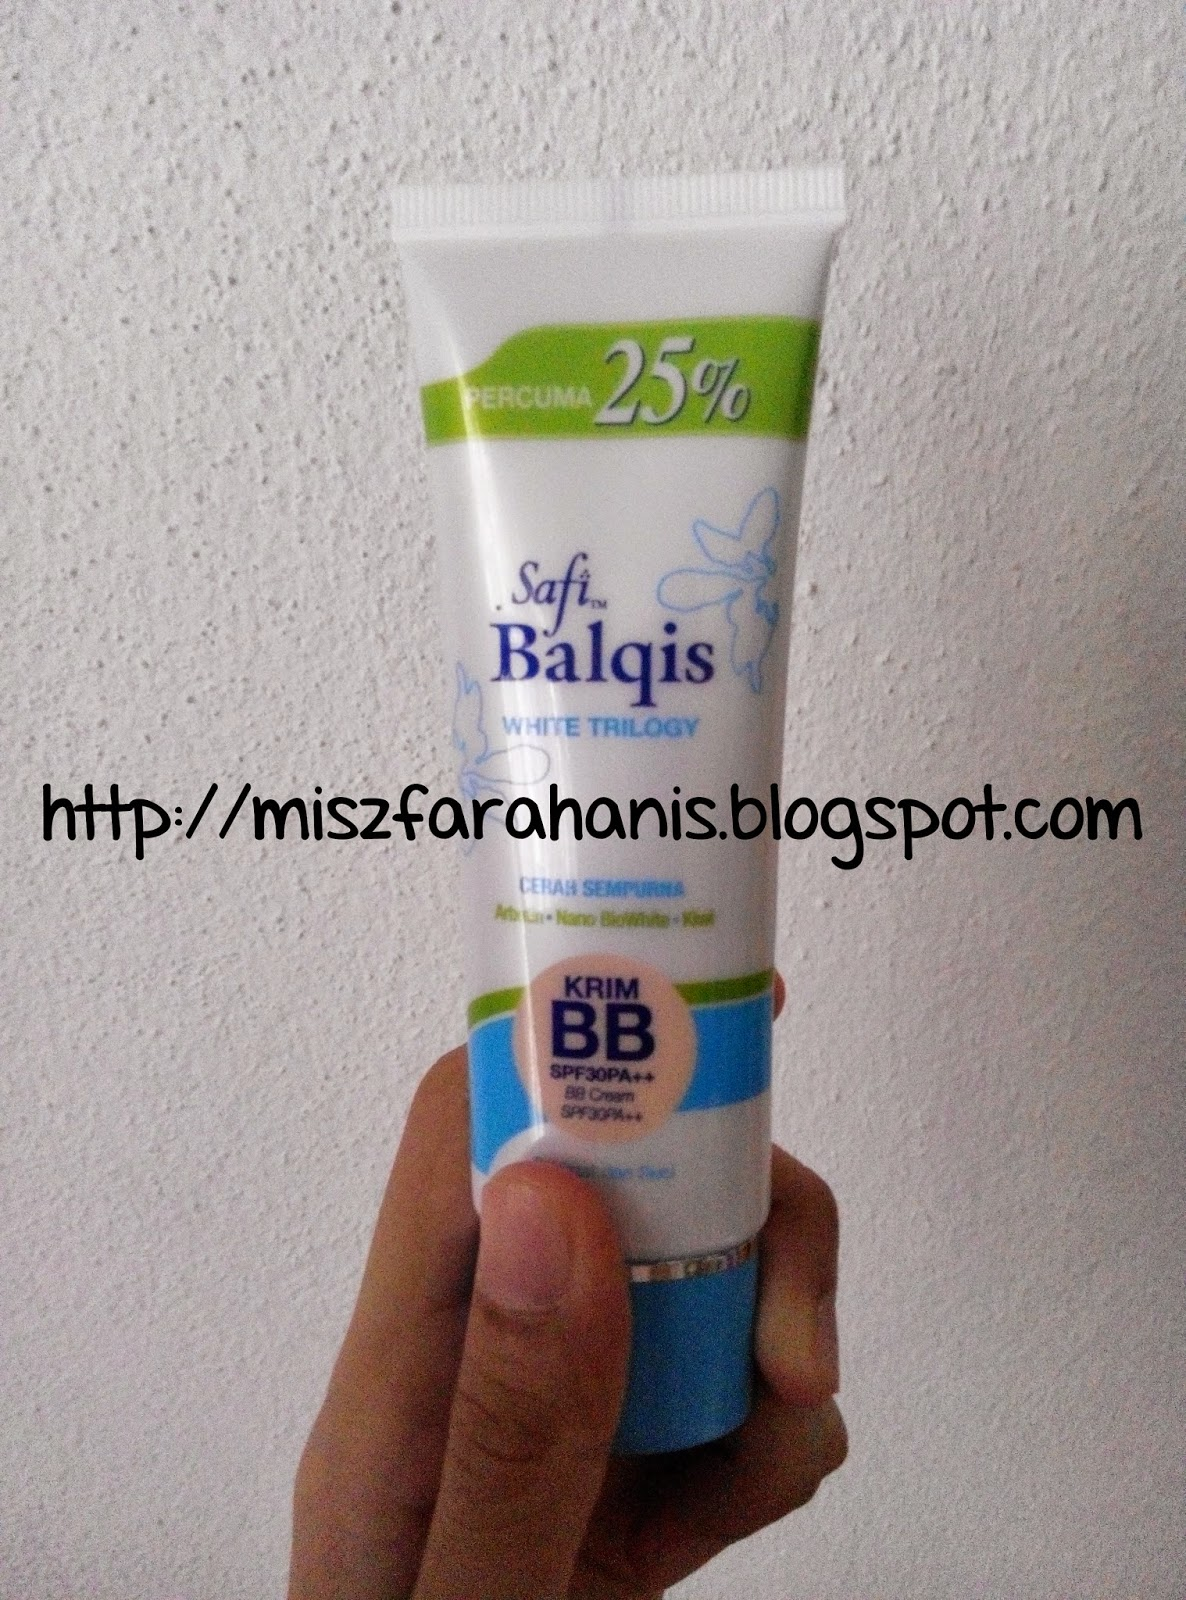 Review: Krim BB/BB Cream Safi Balqis White Trilogy | anis